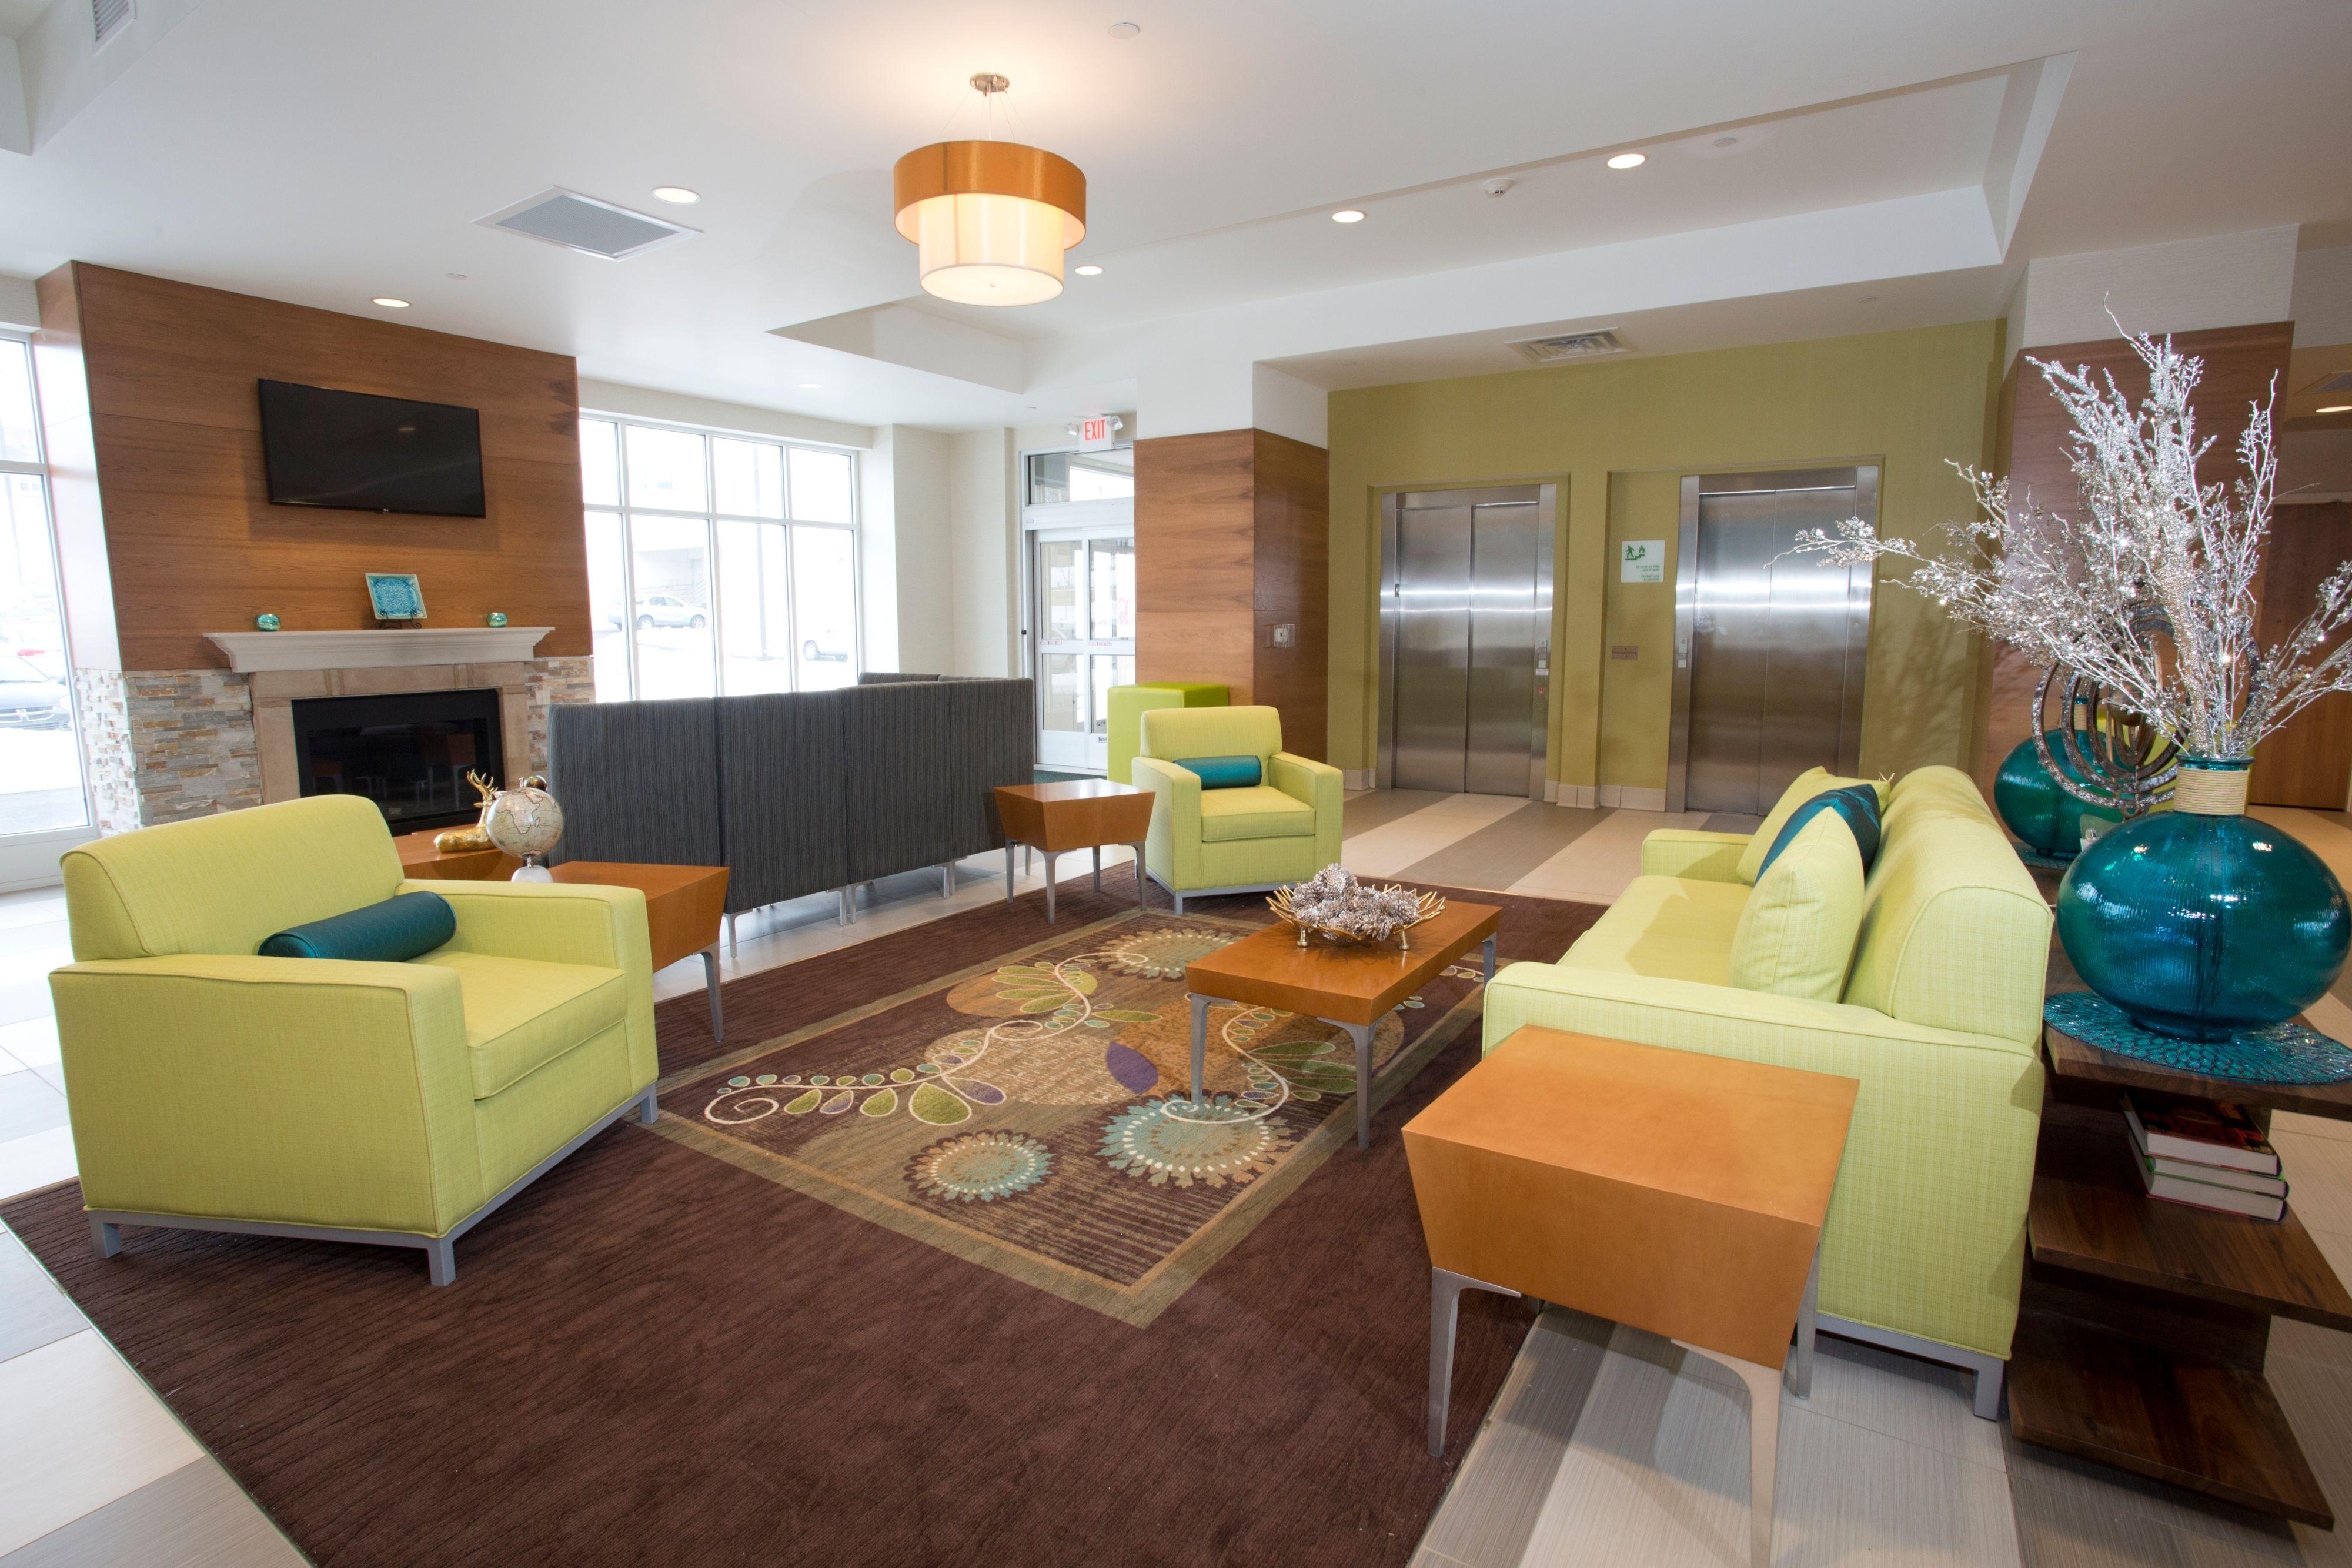 Holiday Inn Morgantown - University Area image 4